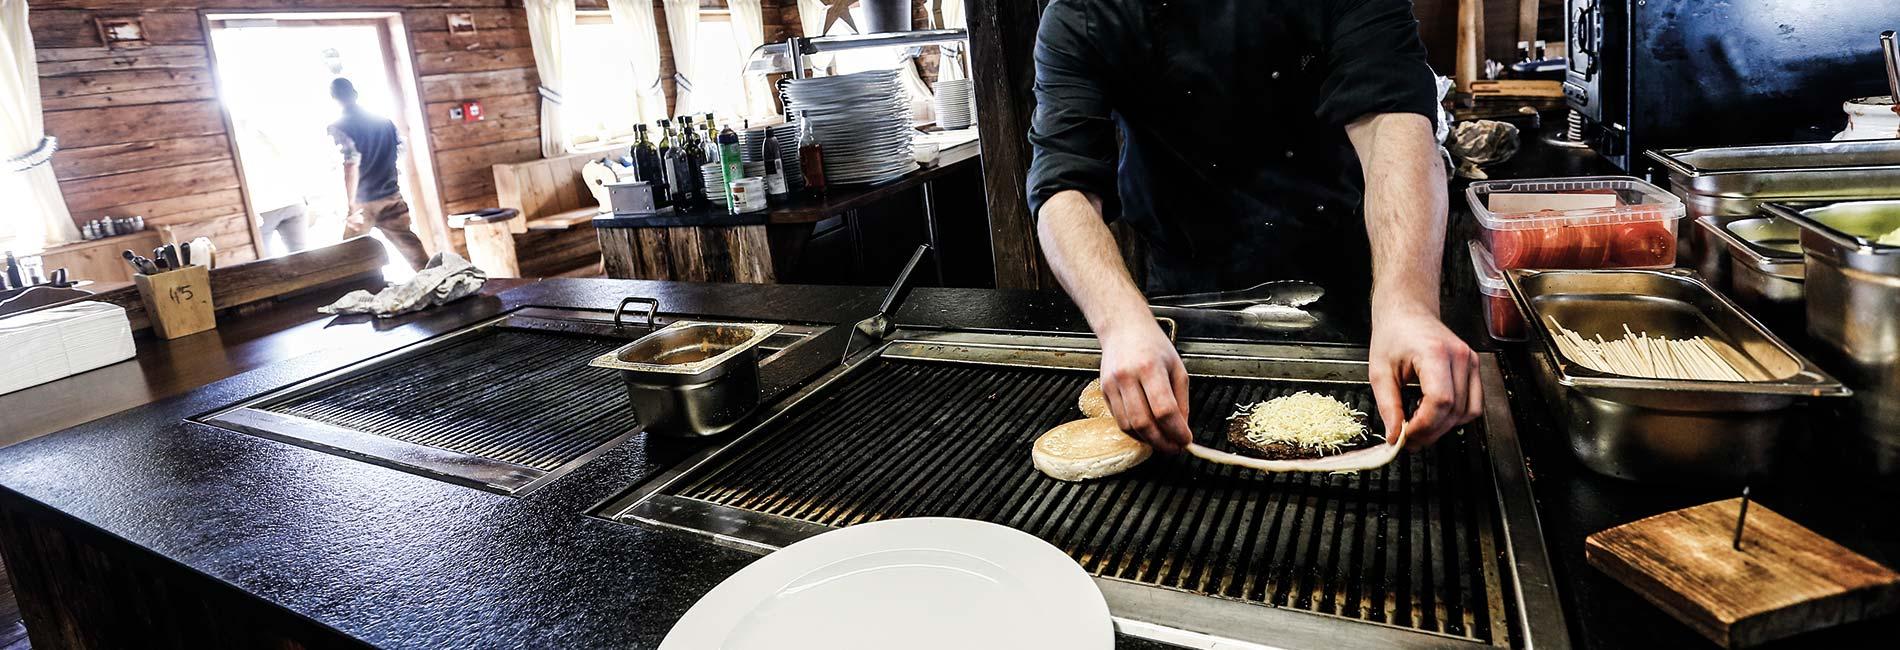 Jobs Gastronomie im Skigebiet Obergurgl Hochgurgl Sölden